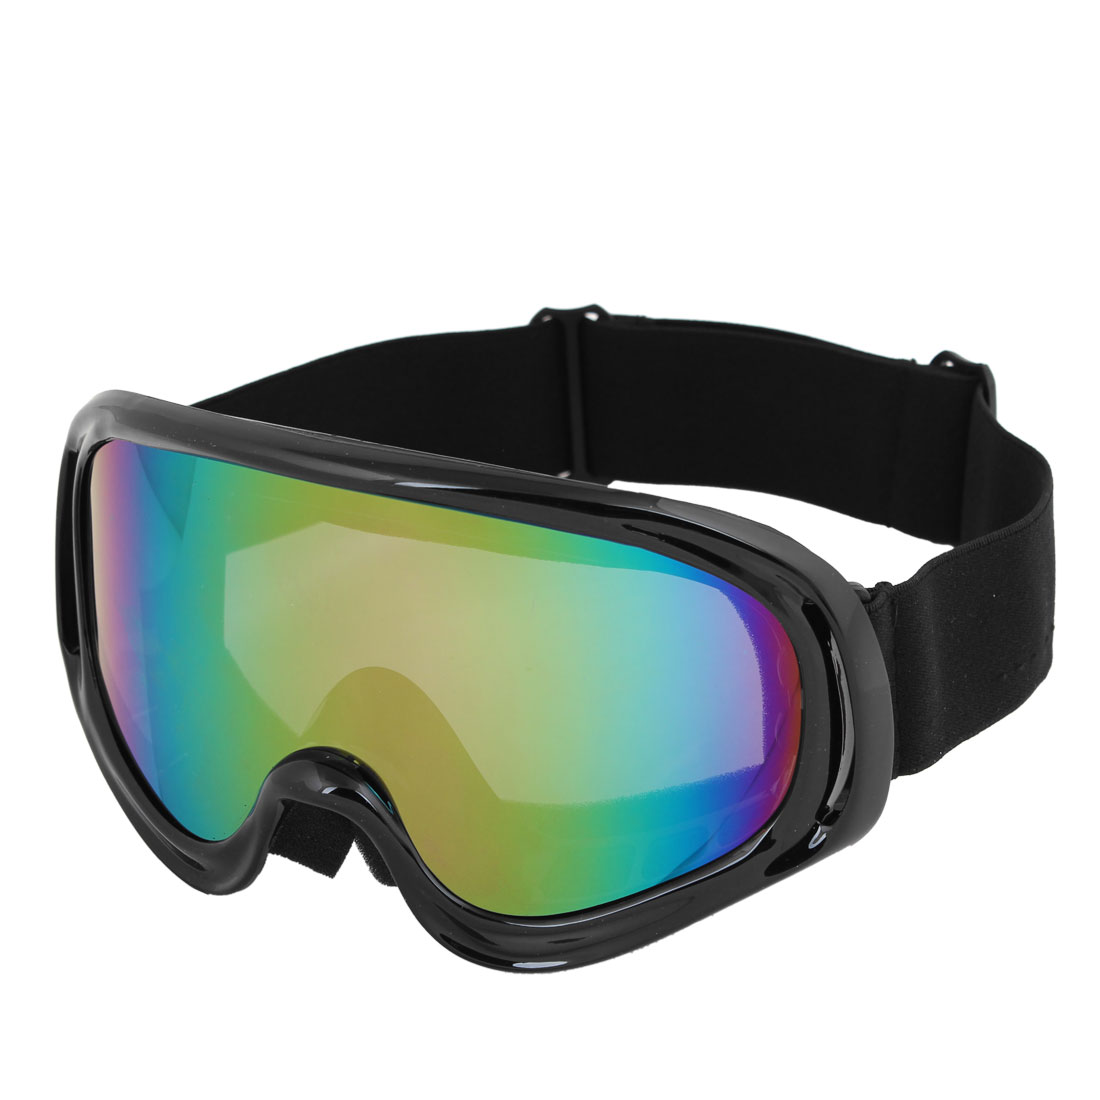 Men Black Frame Elastic Strap Colorful Lens Windproof Motorcycle Goggles Eyewear